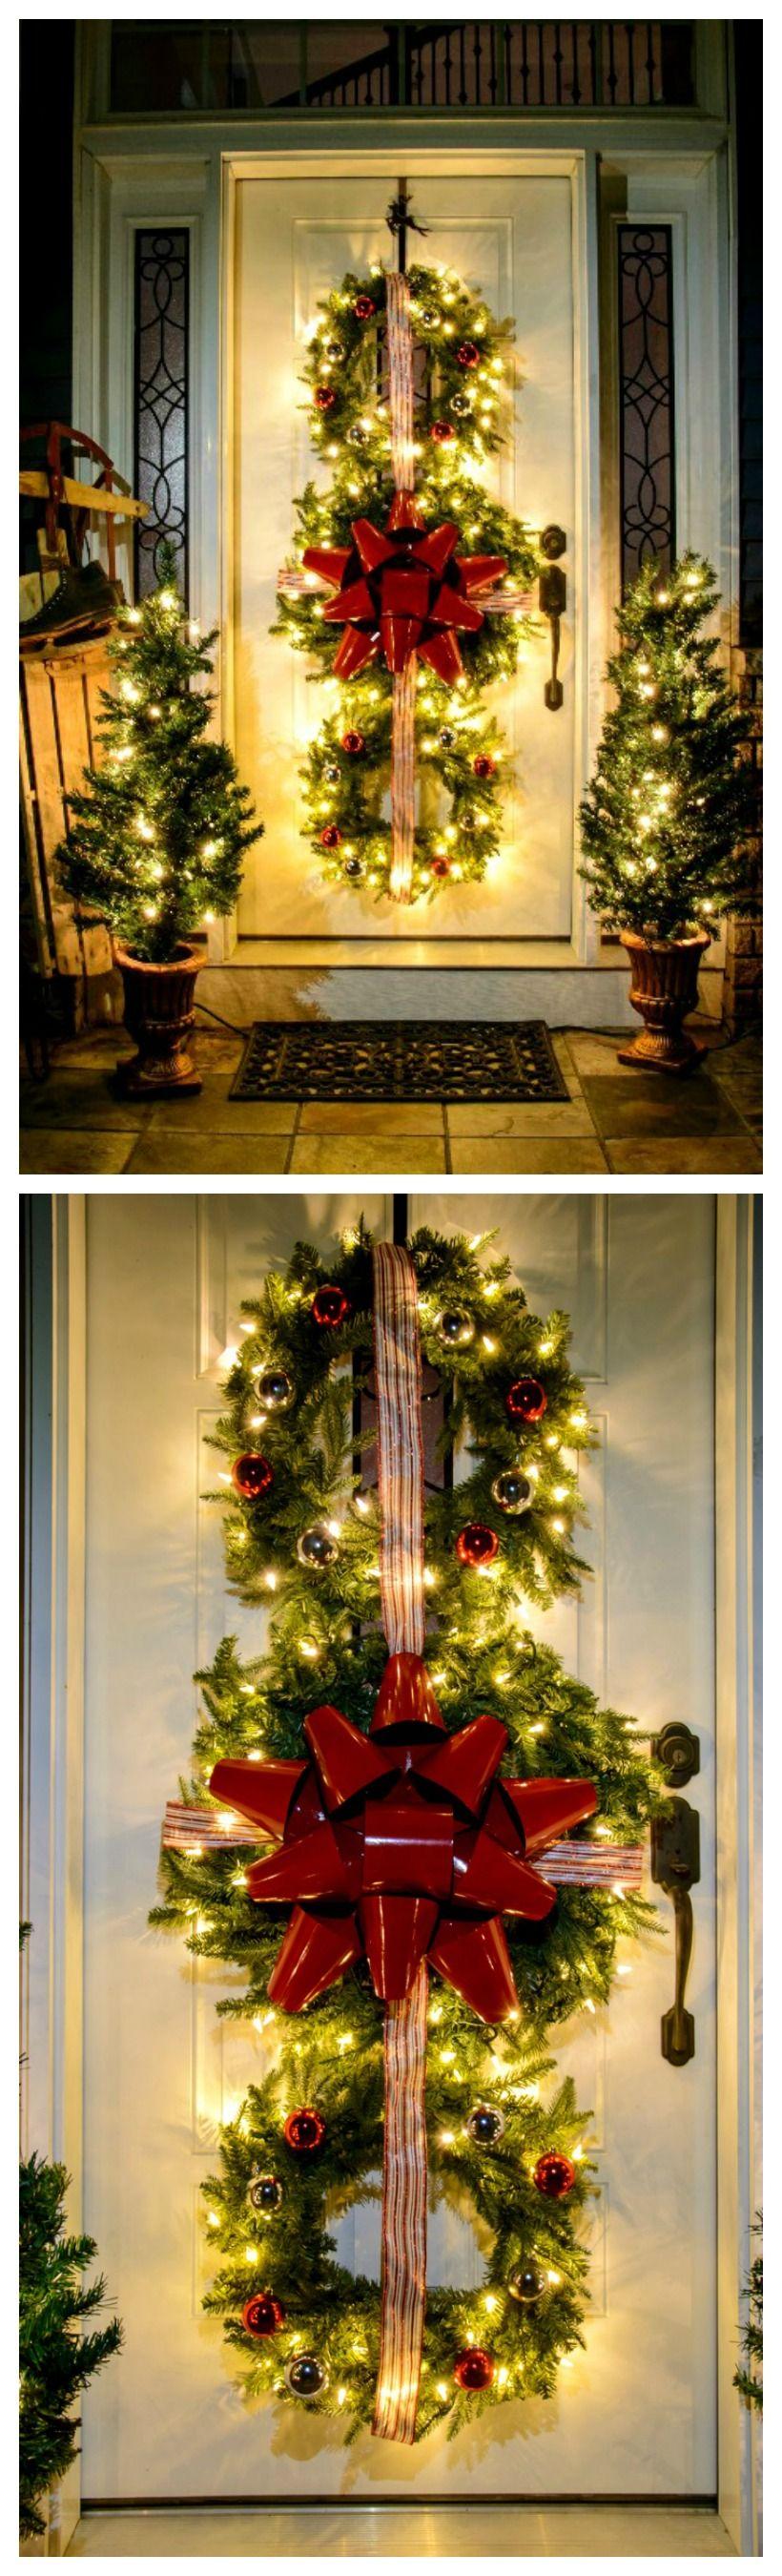 How to Make a Christmas Wreath Trio | Christmas decor, Wreaths and ...